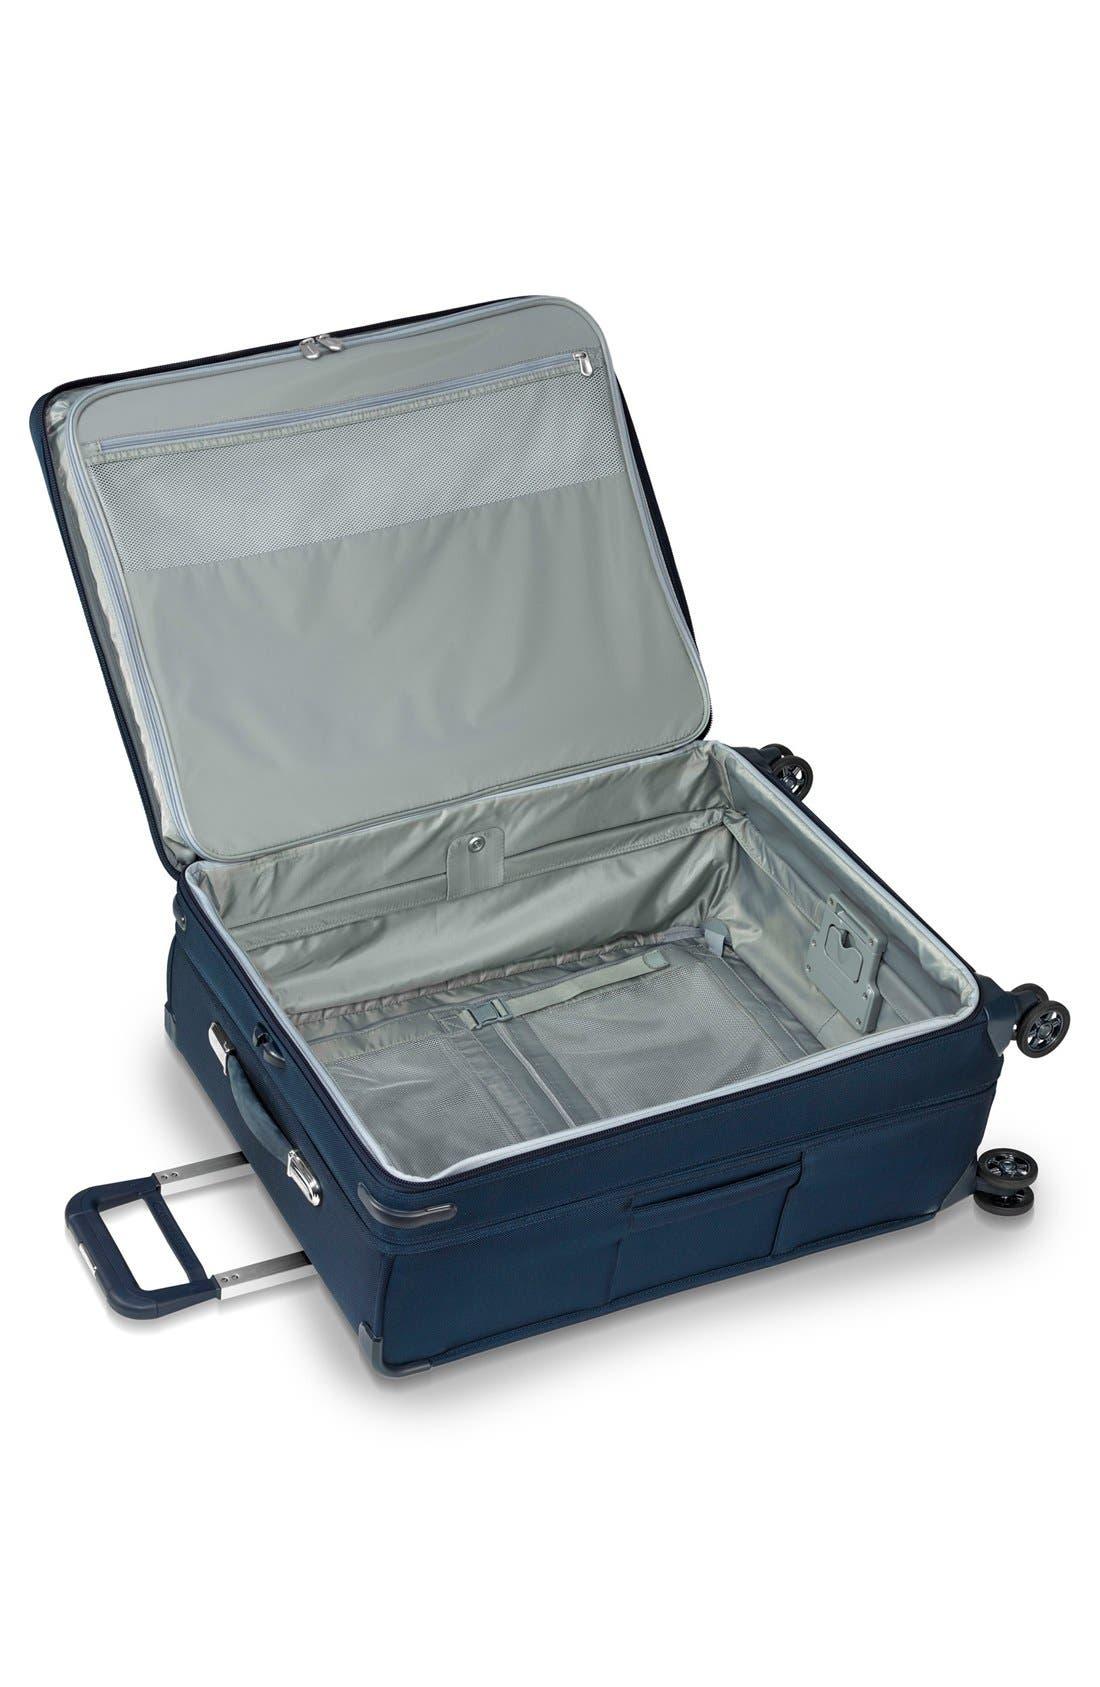 Baseline 28 Inch Expandable Rolling Suitcase,                             Alternate thumbnail 2, color,                             Navy